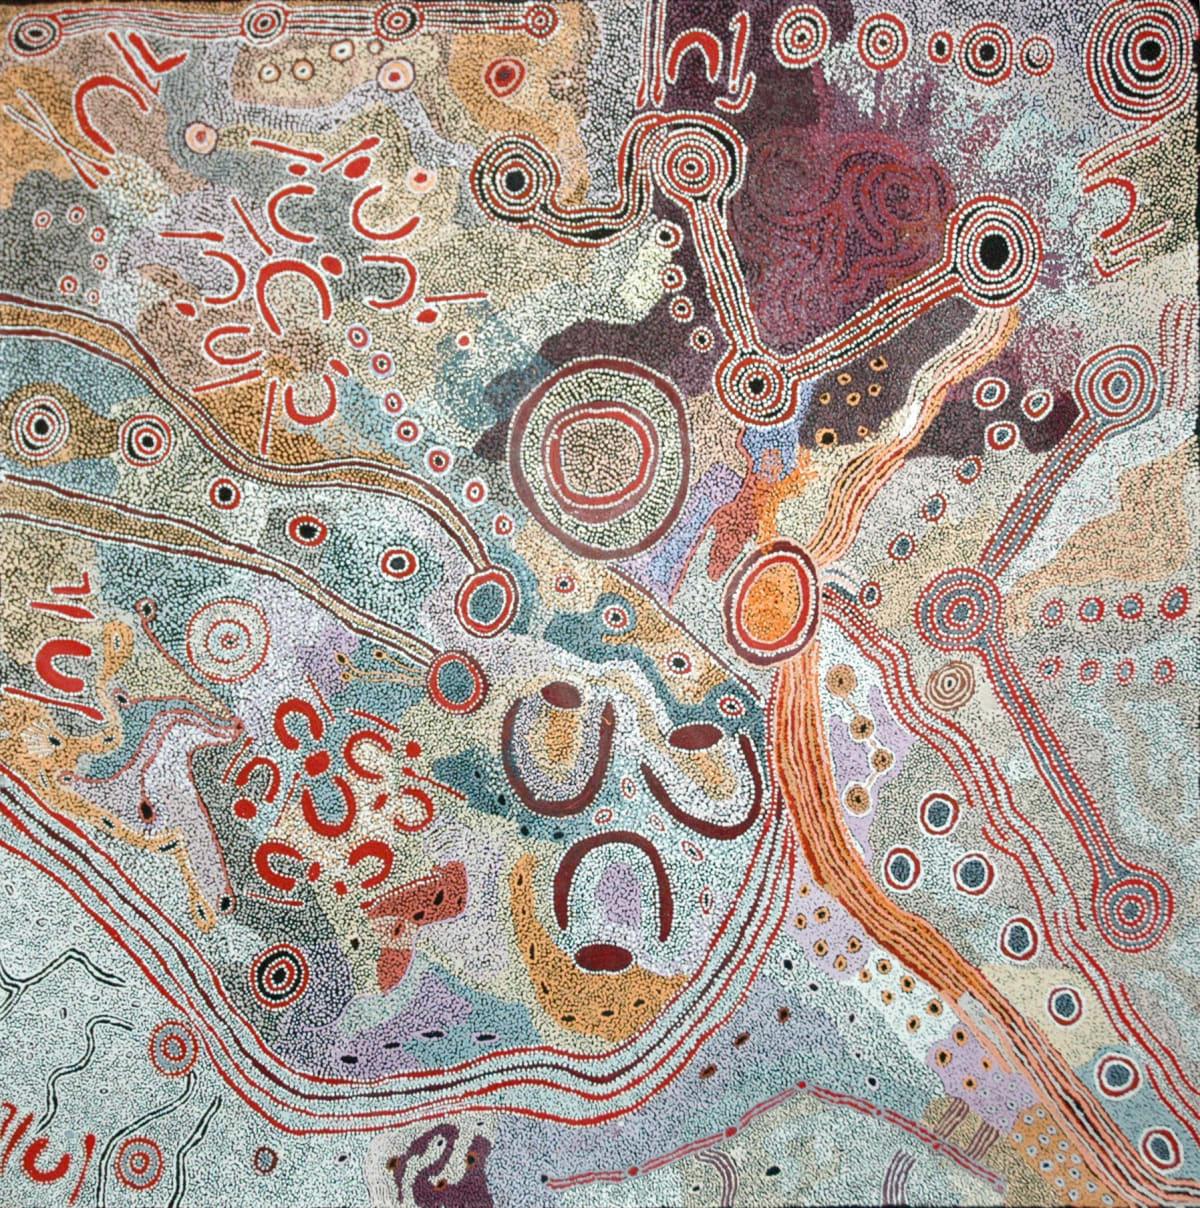 Iluwanti Ken & Mary Katatjuku Pan Seven Sisters acrylic on linen 197 x 198 cm